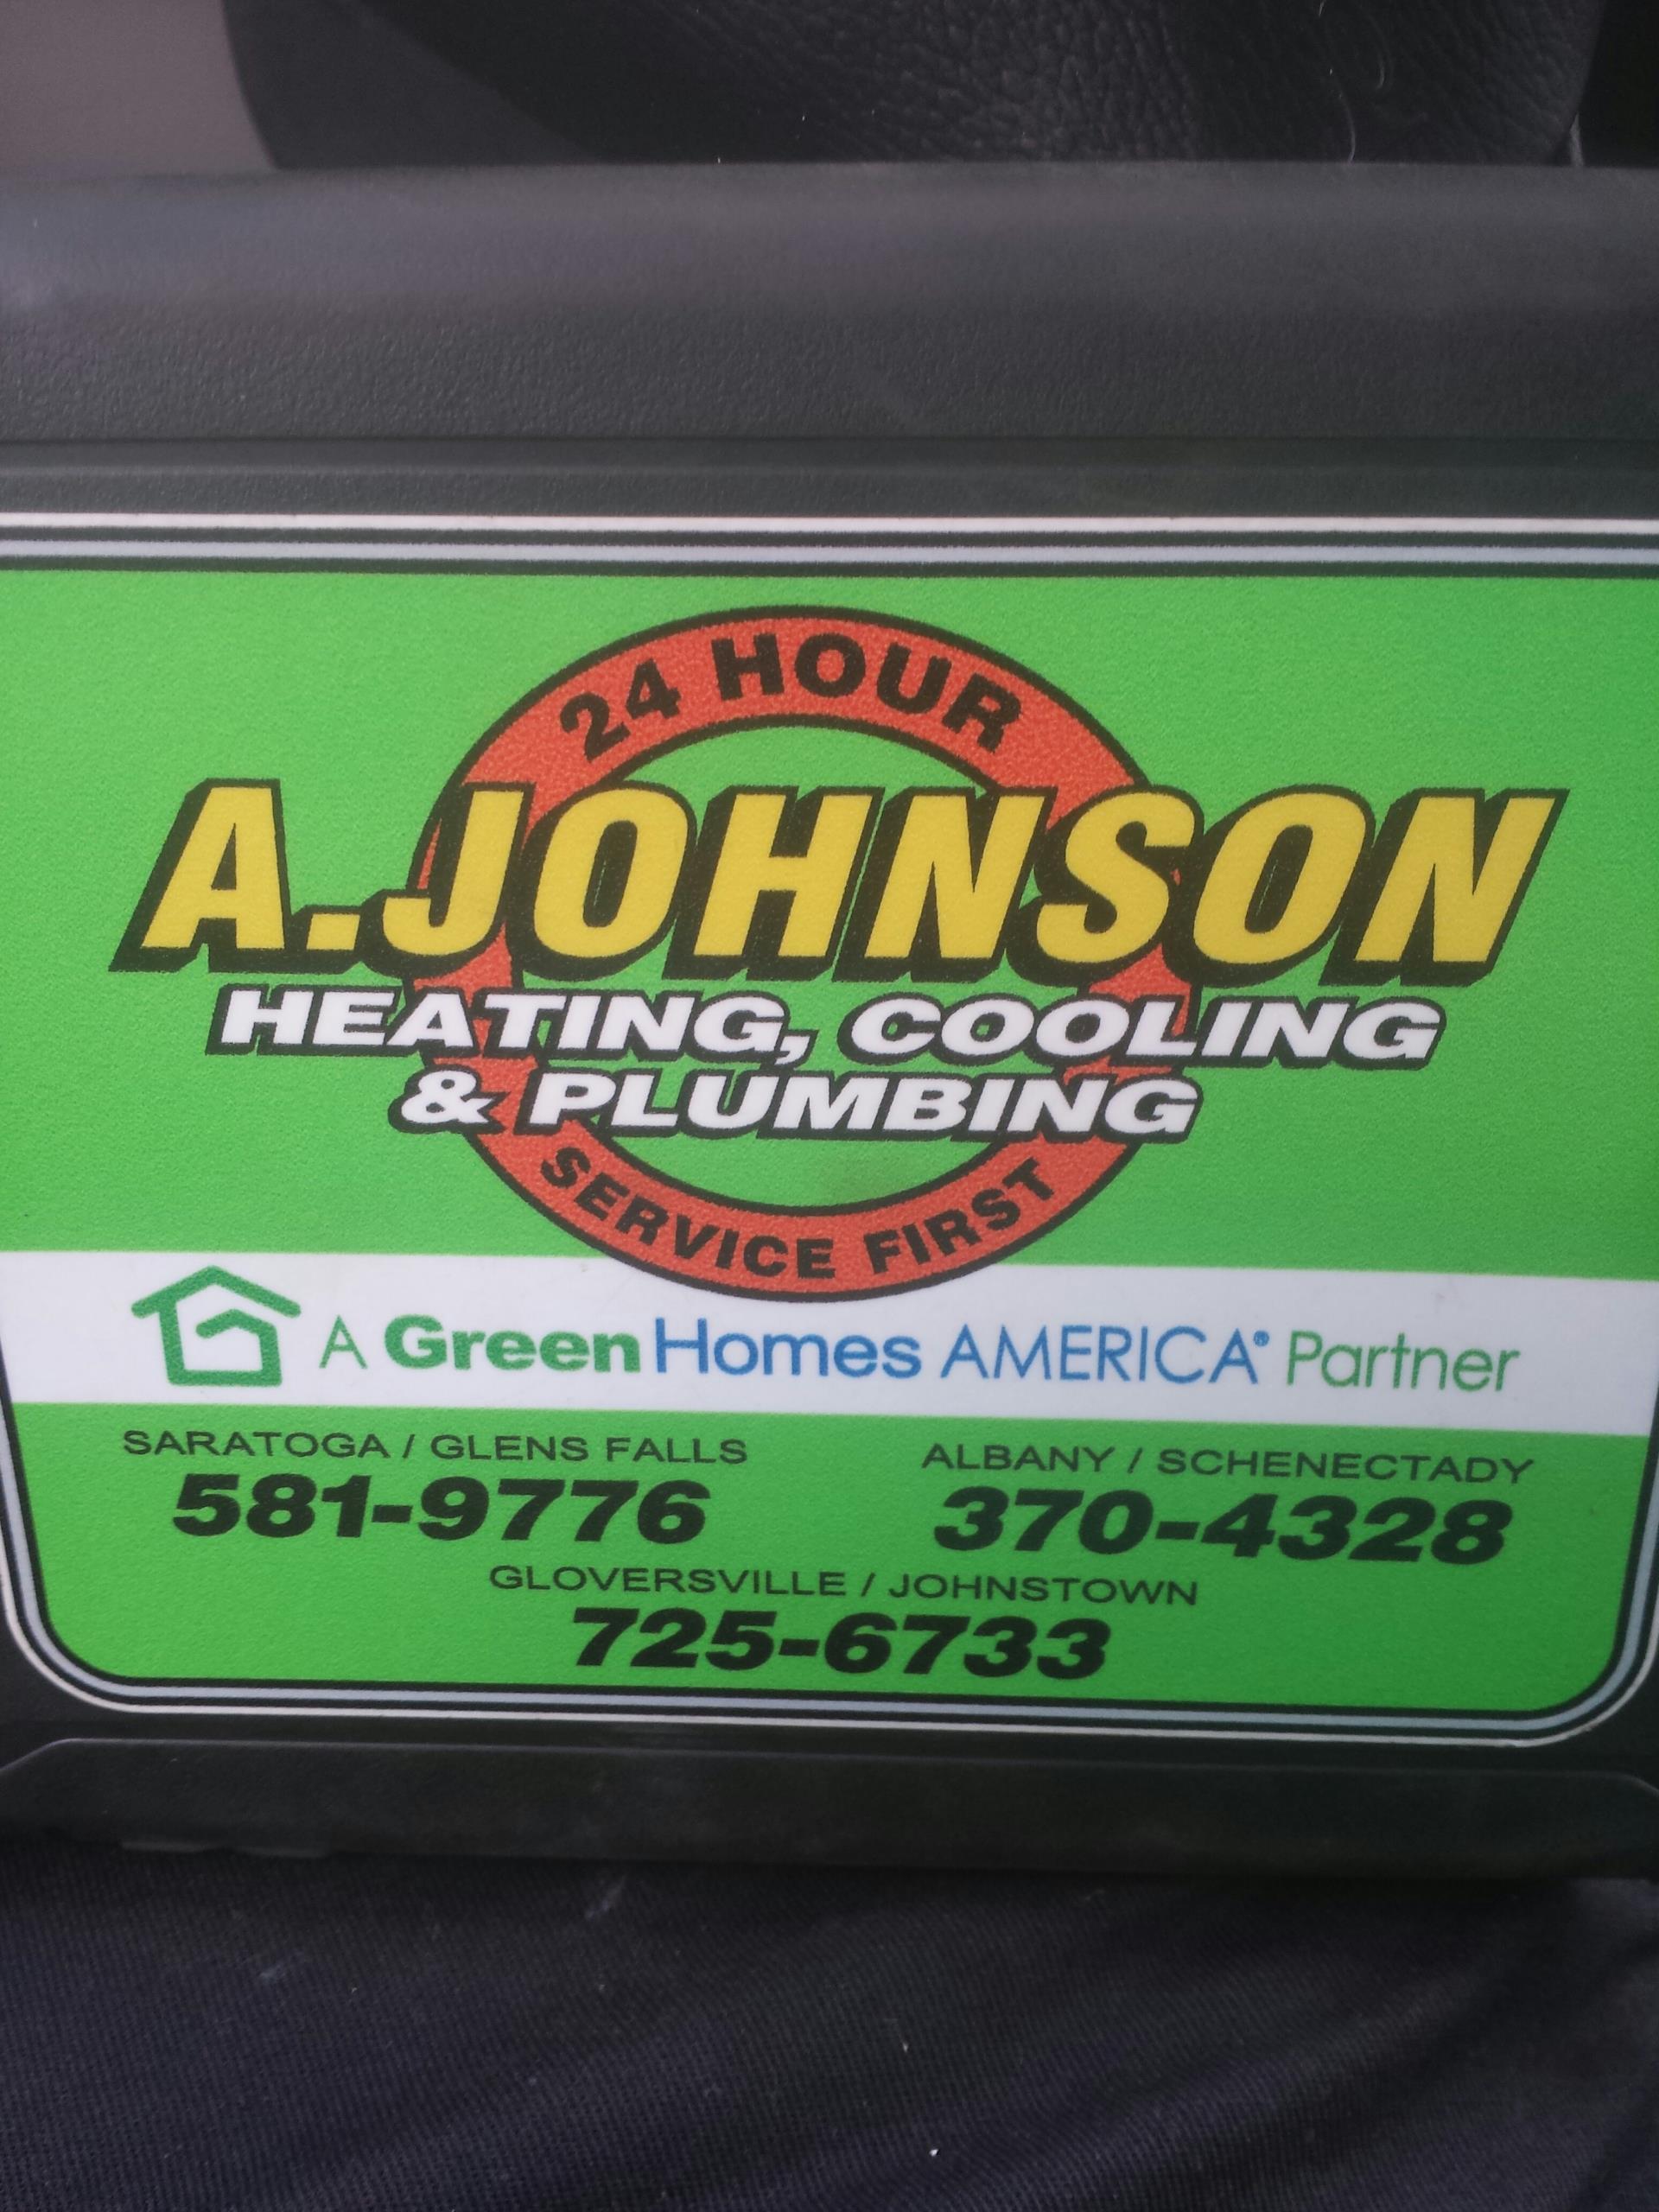 Clifton Park, NY - Delta faucet repair, Taco zone control, outdoor frost free hose bib